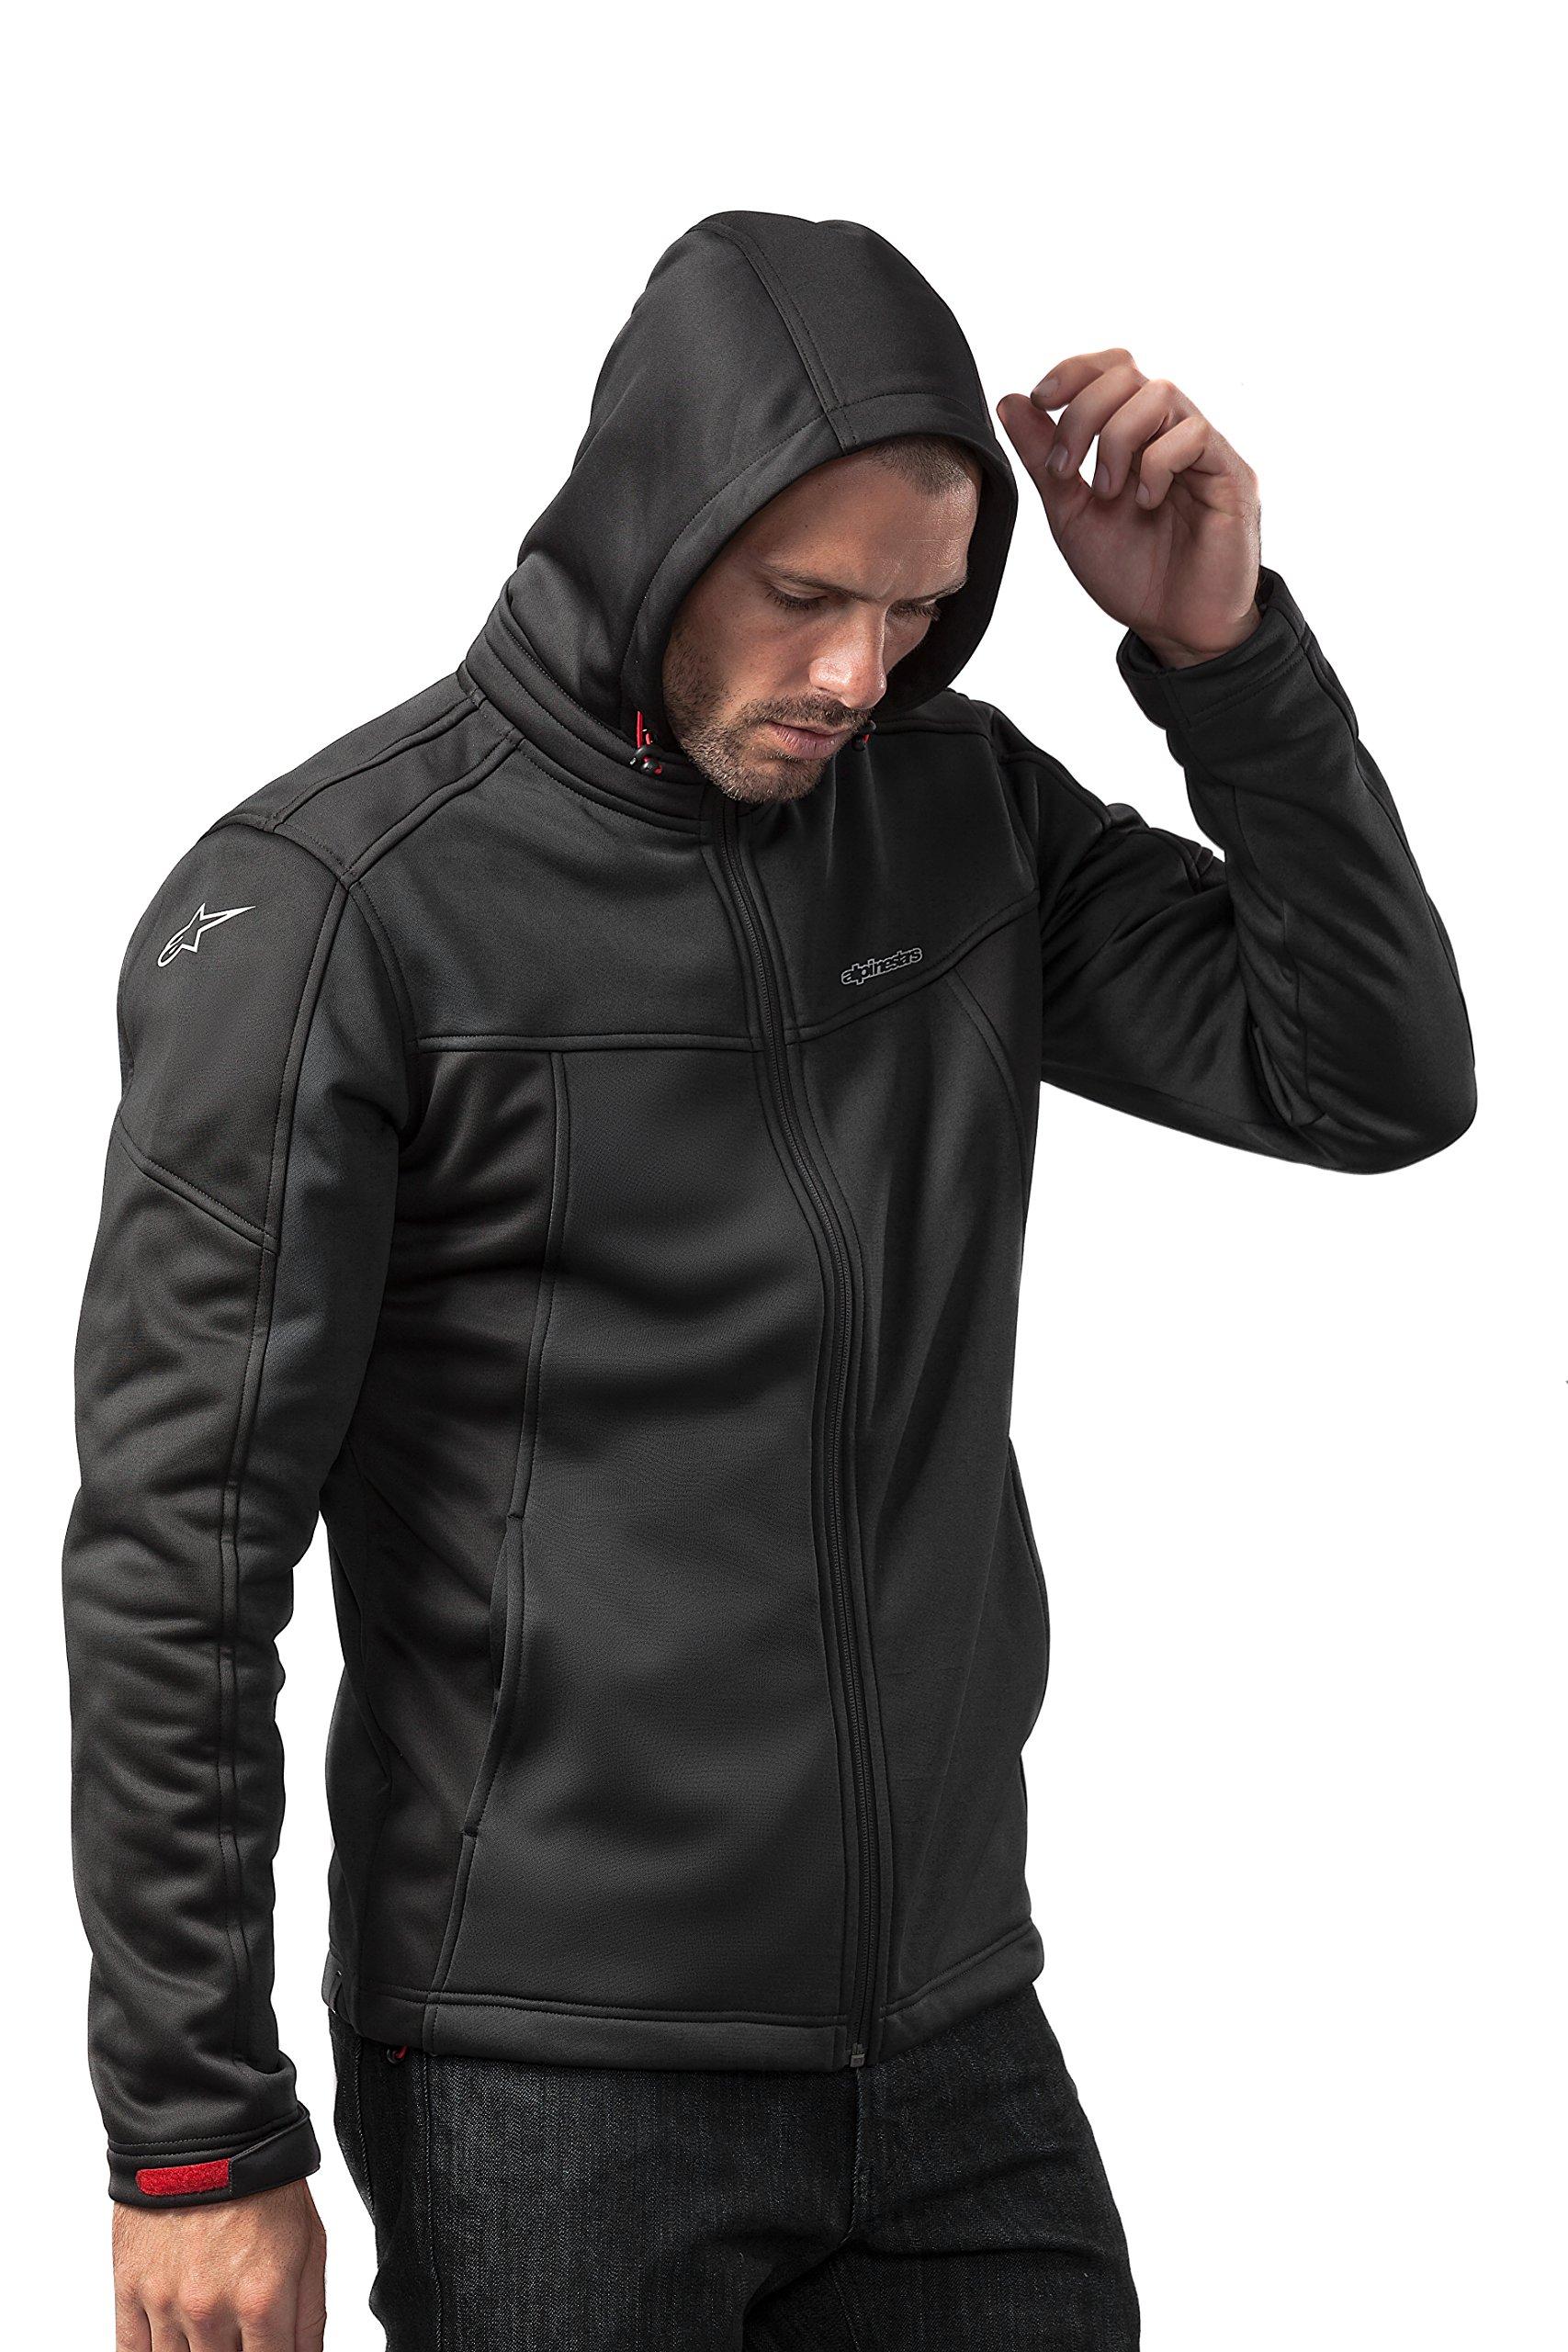 Alpinestars Men's Modern Fit Stretch Removable Hood Bunjie Adjusters Tech Bonded Micro Fleece, Stratified Black, L by Alpinestars